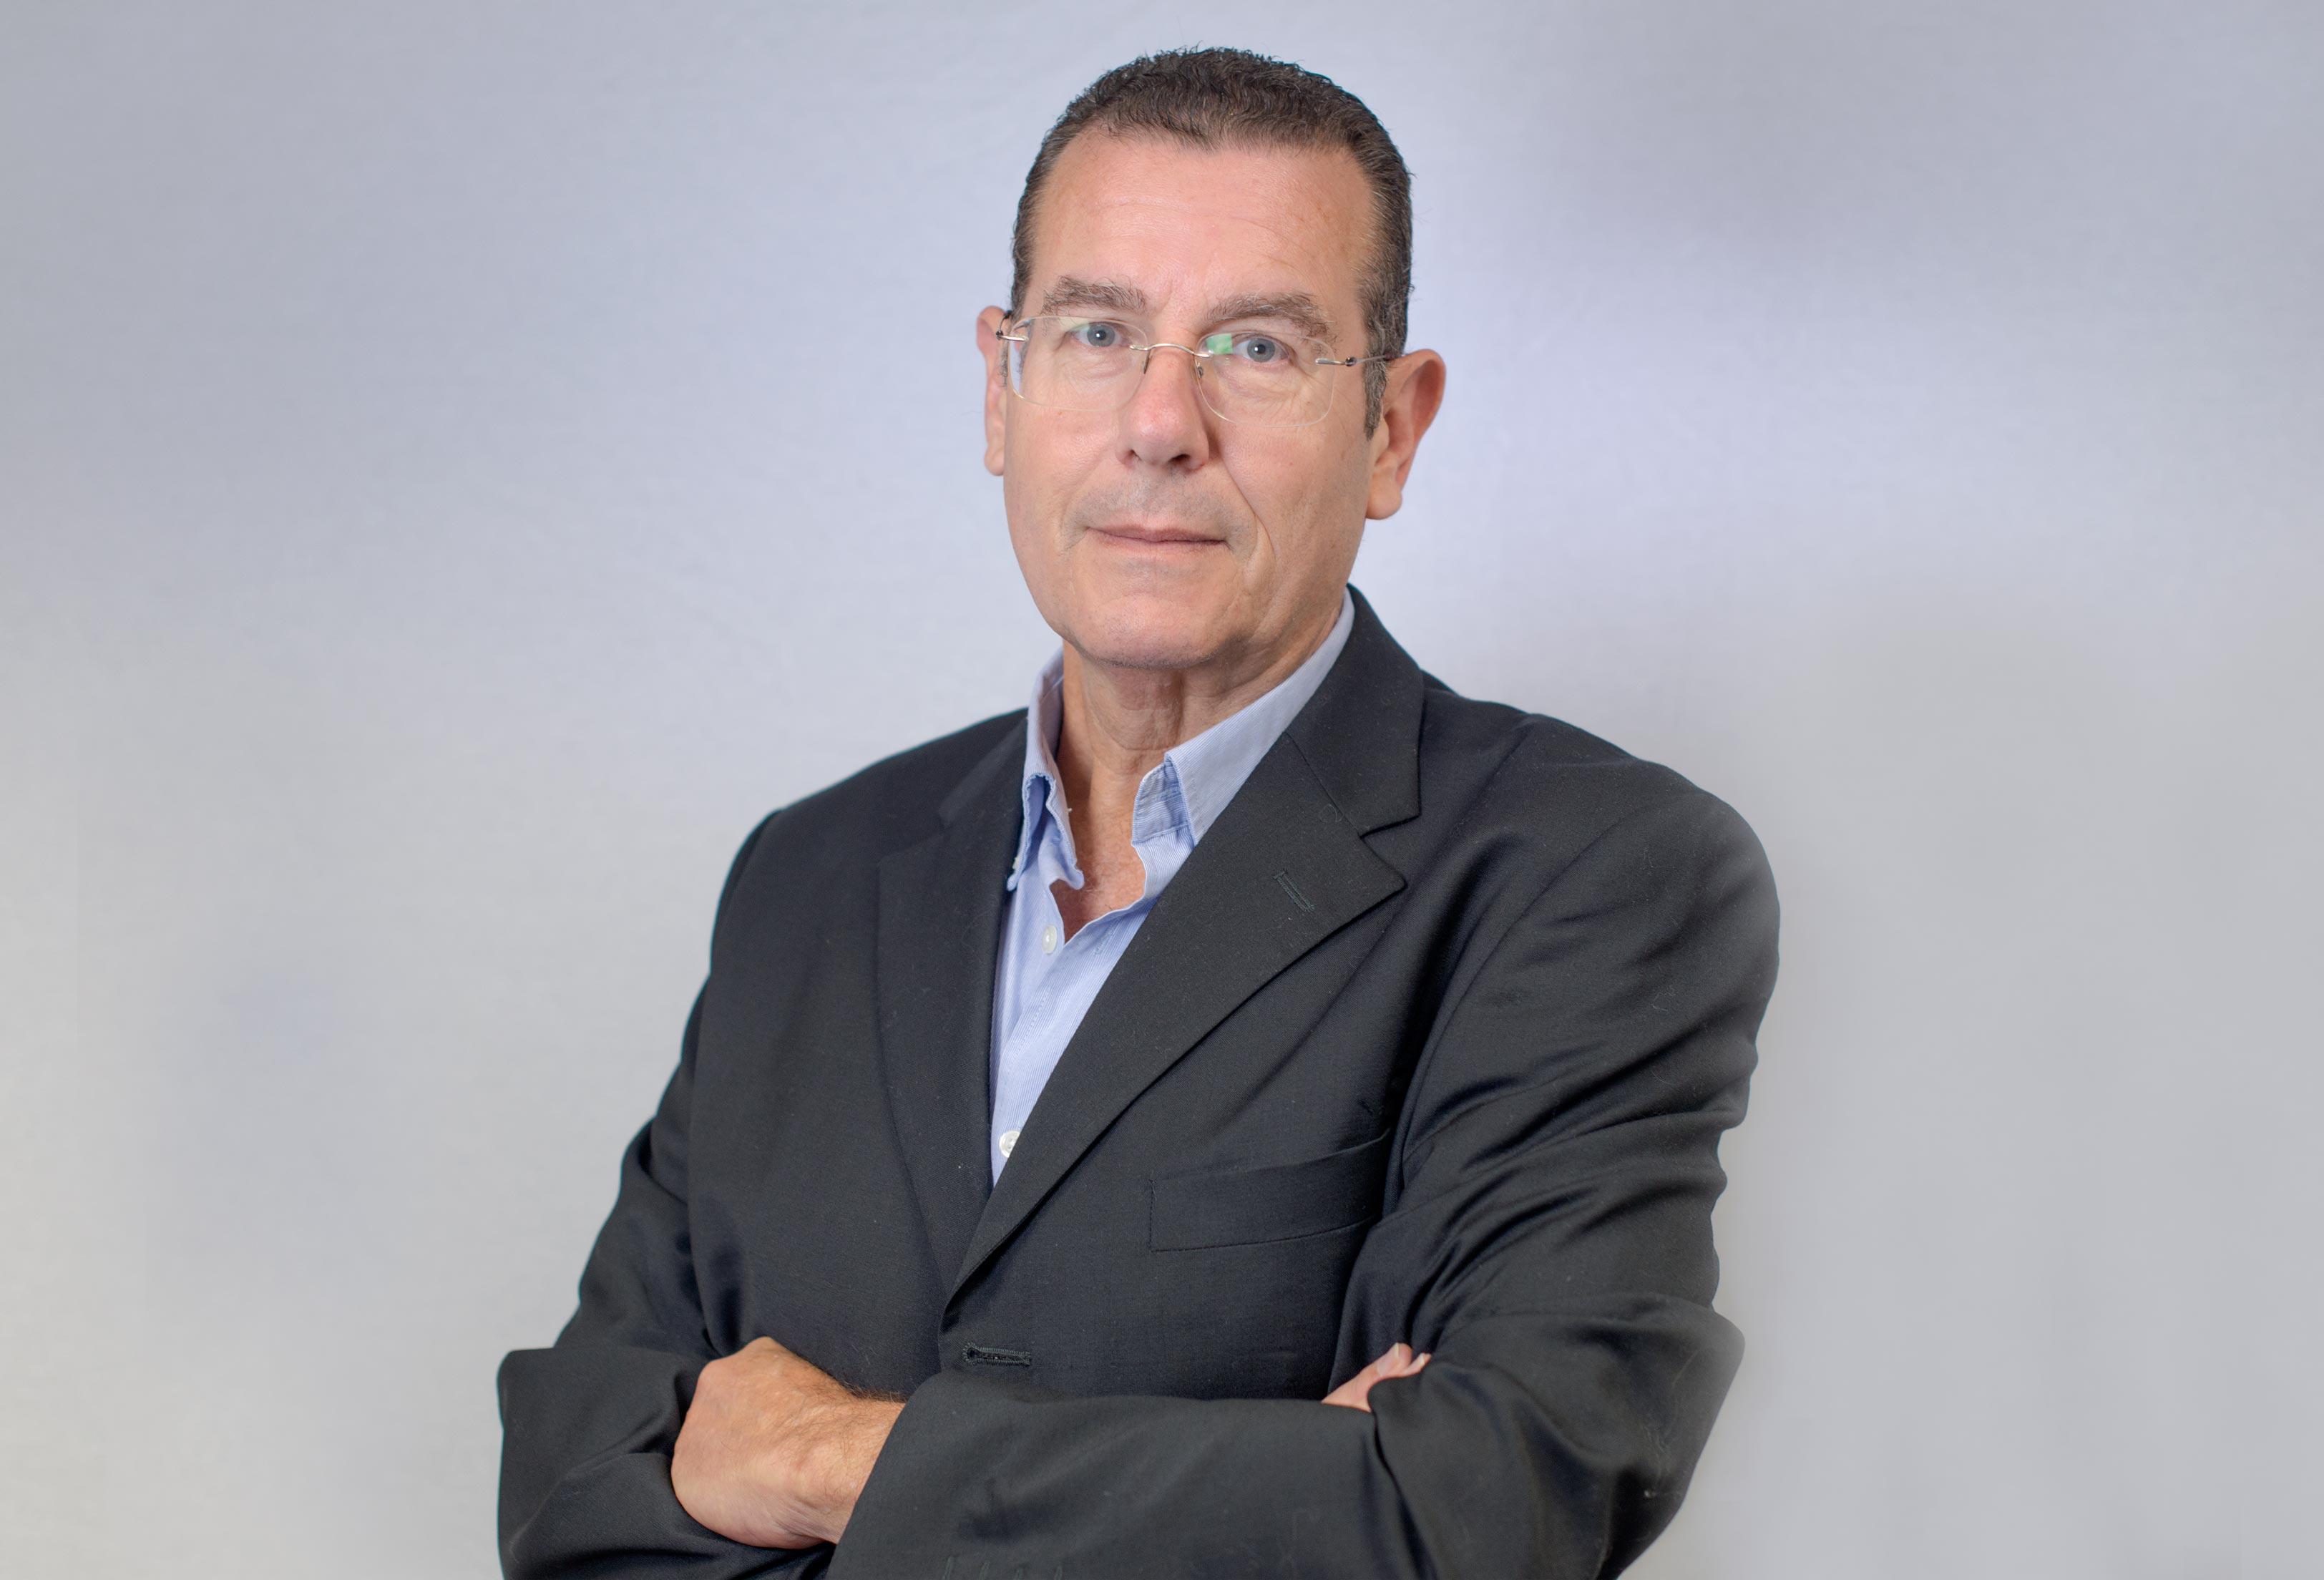 Juan Sáenz Corcuera